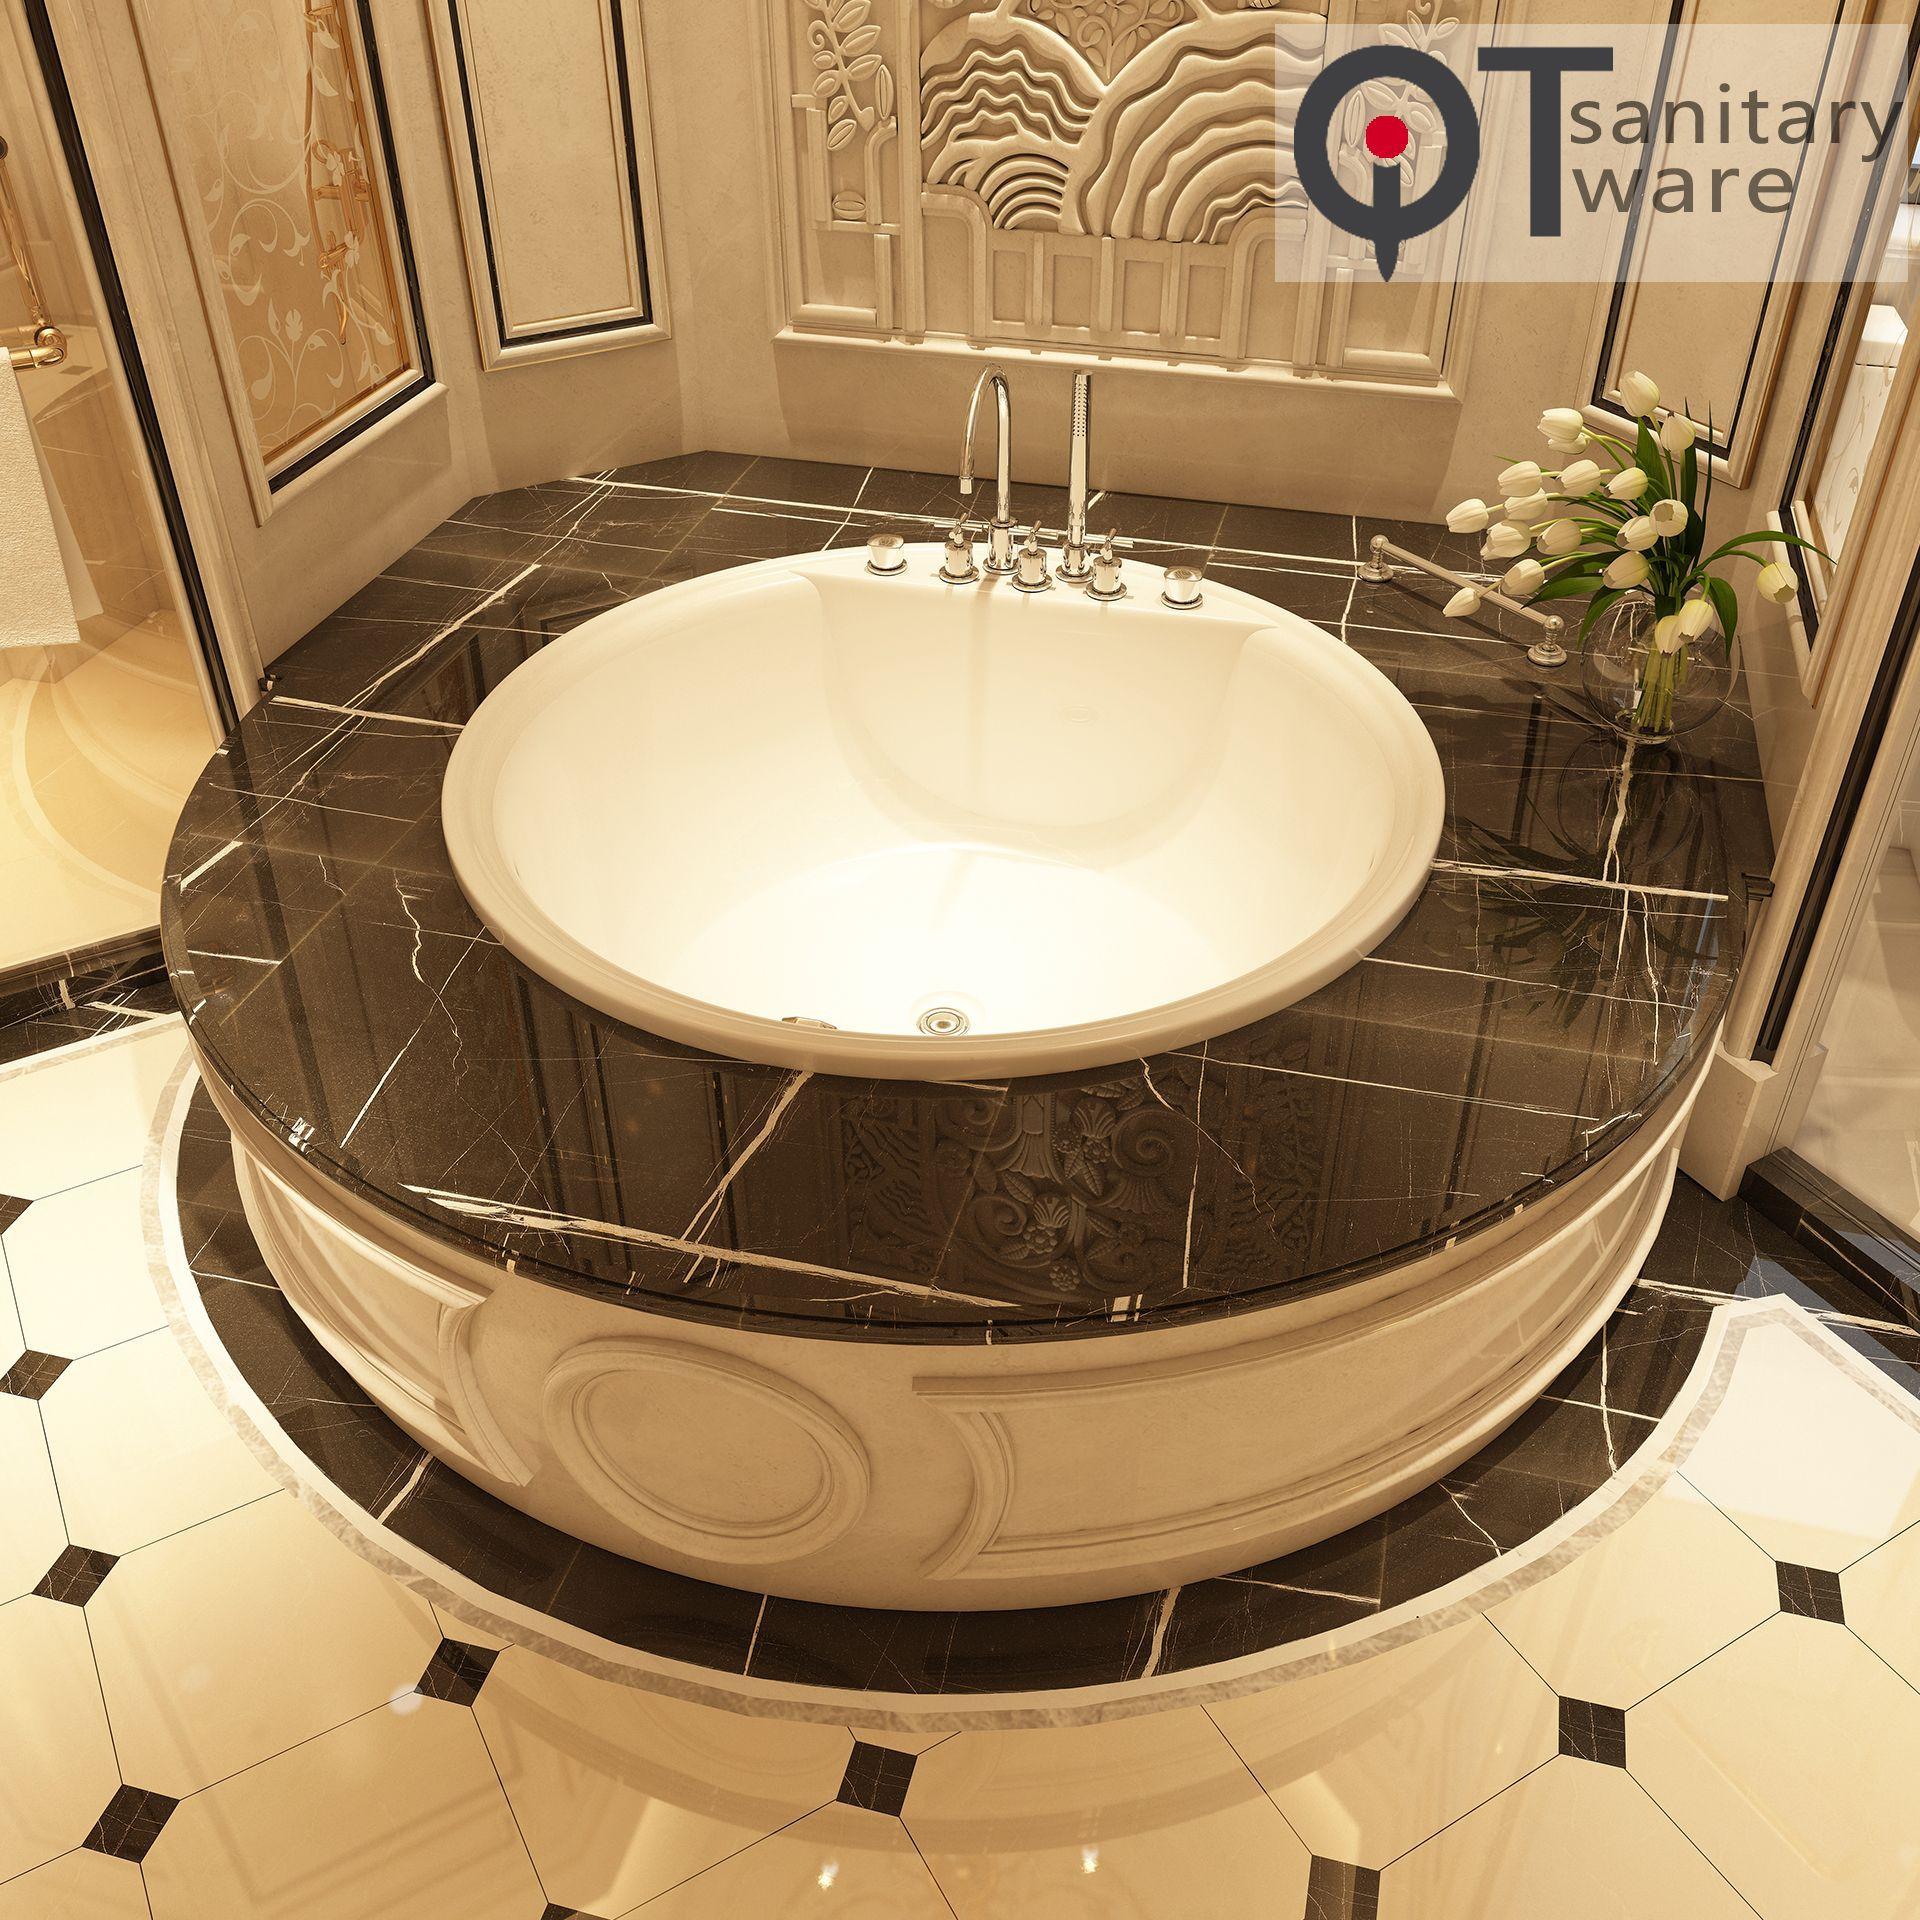 Home hotel traditional round acrylic built-in bathtub QT-6012Q